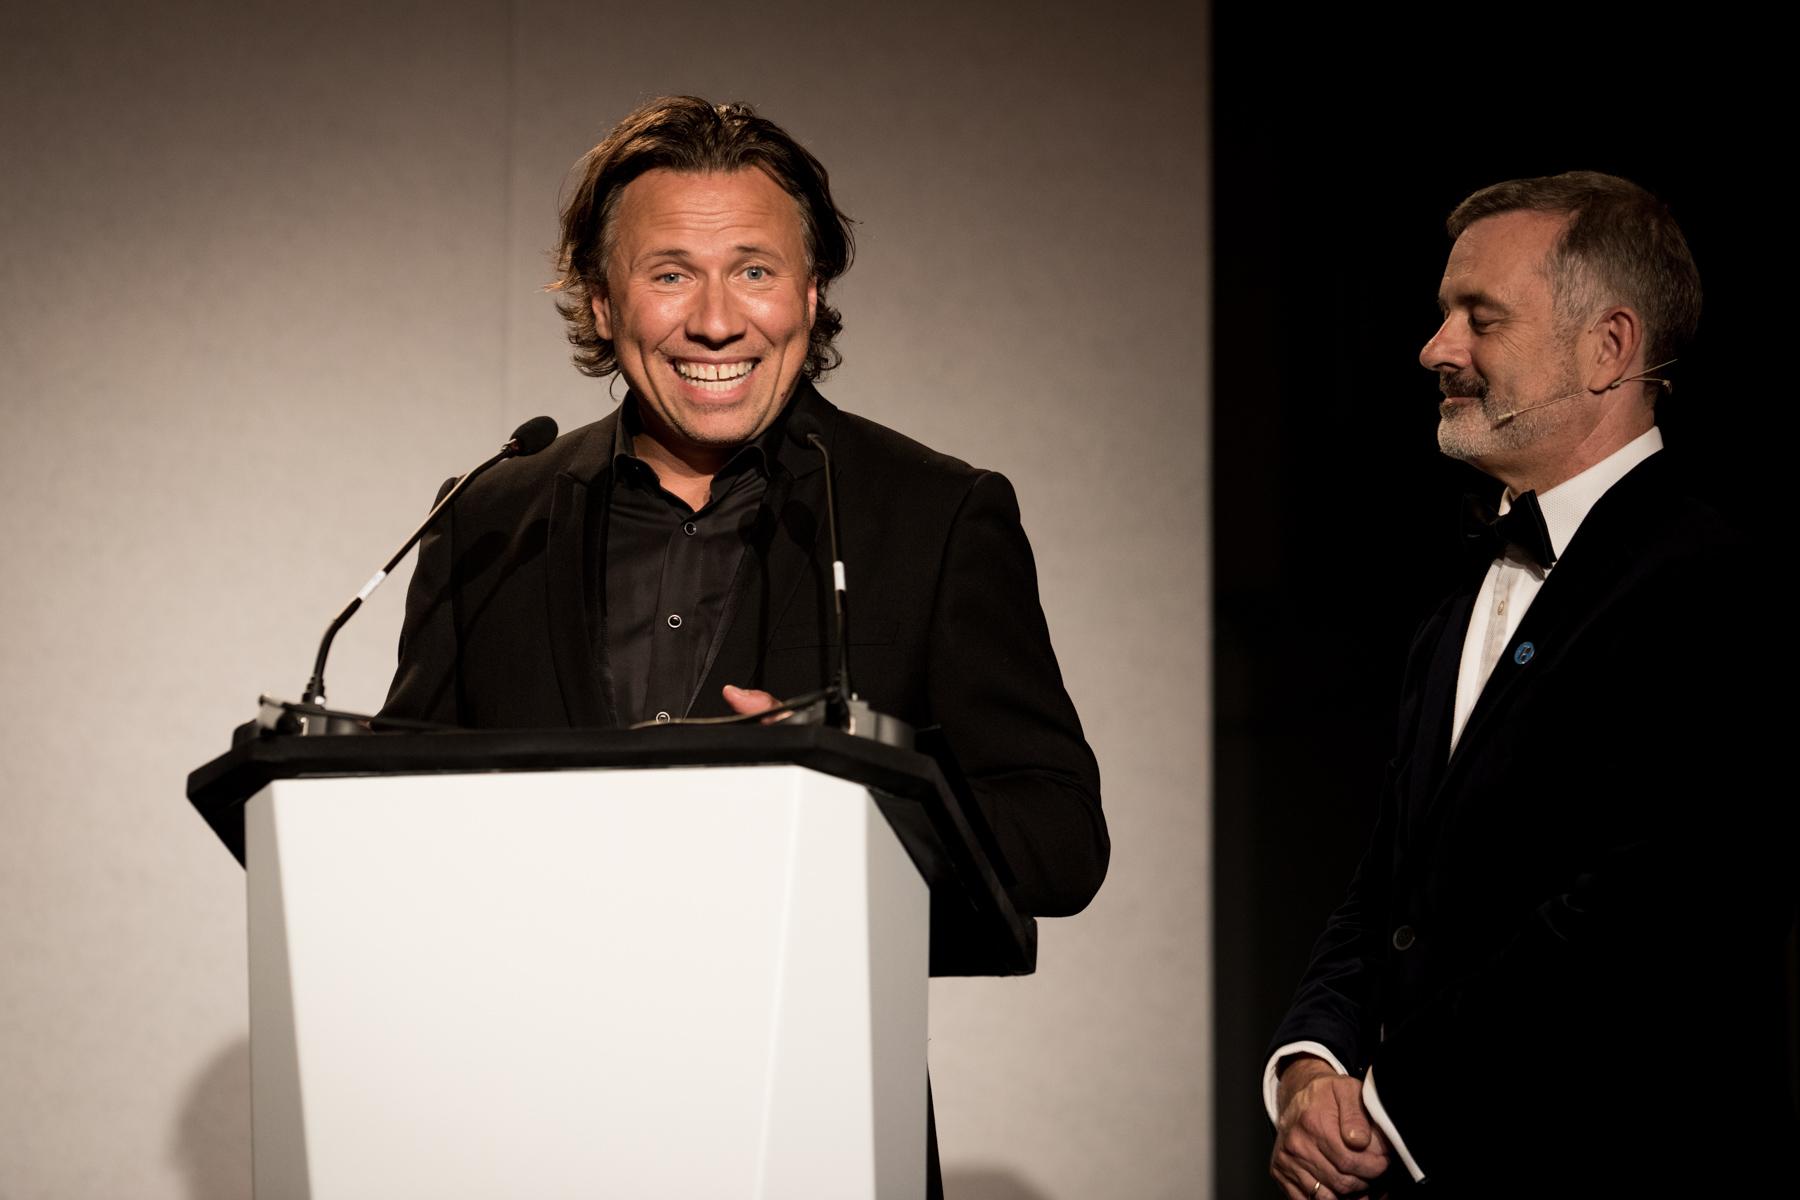 Kristjan Järvi pays tribute to his father, Neeme, winner of the Lifetime Achievement Award